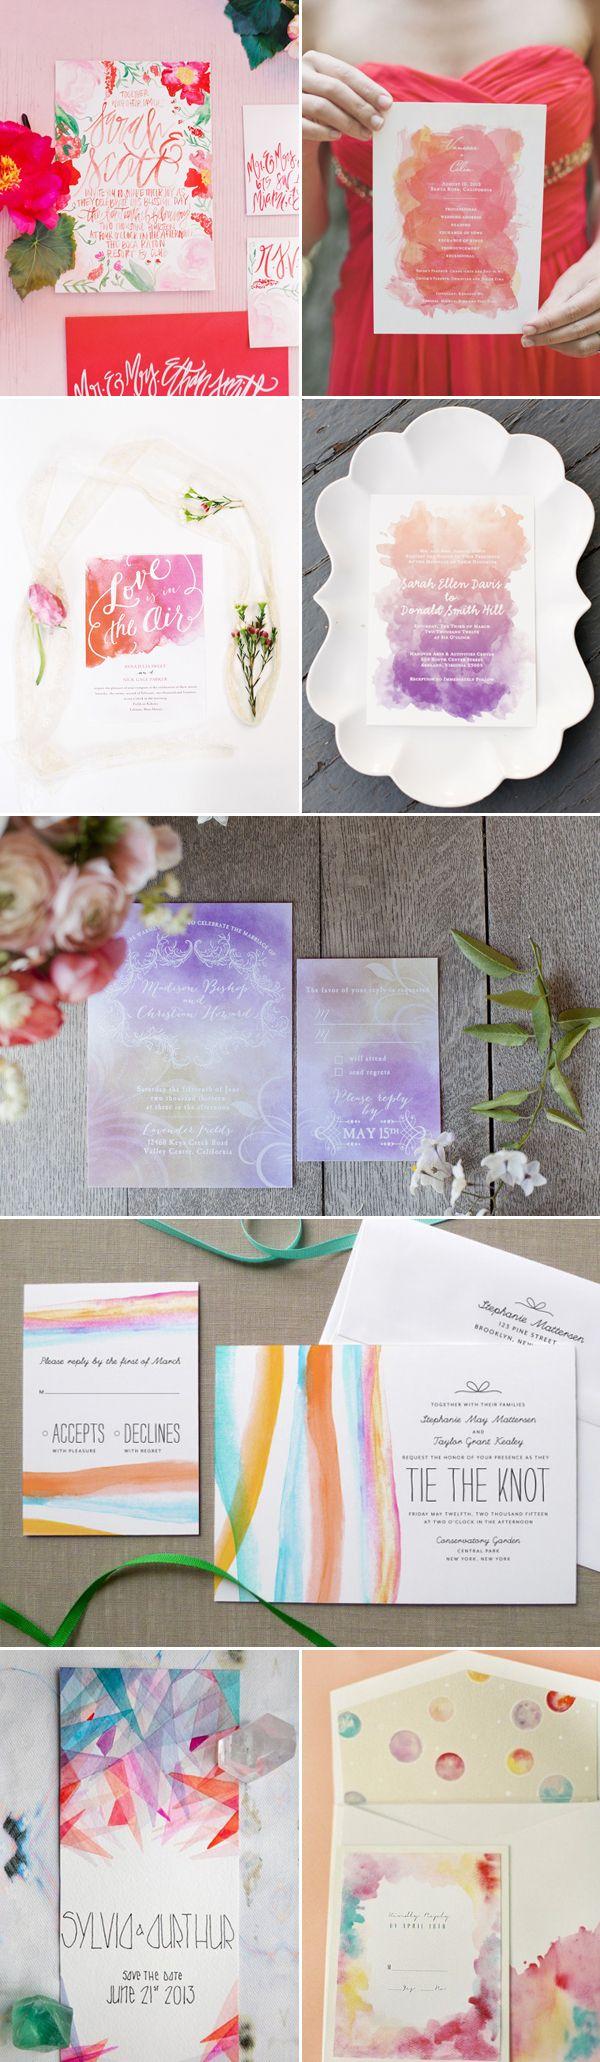 23 Most Beautiful Watercolor Invitations - Passionate